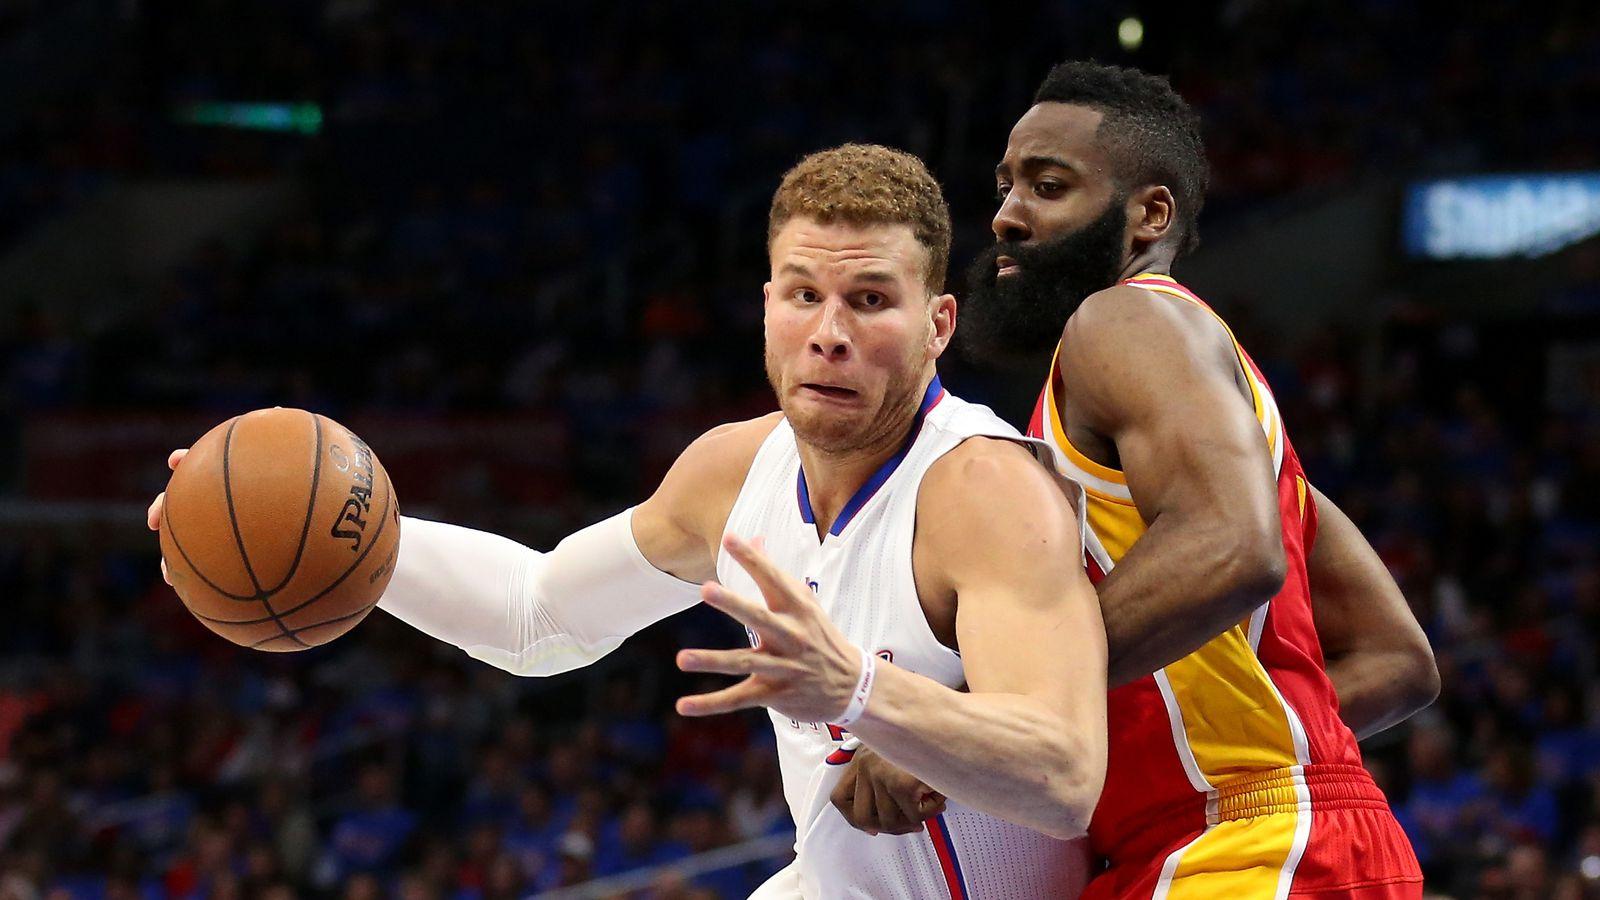 Cleveland Cavaliers Vs Golden State Warriors Live Score | Basketball Scores